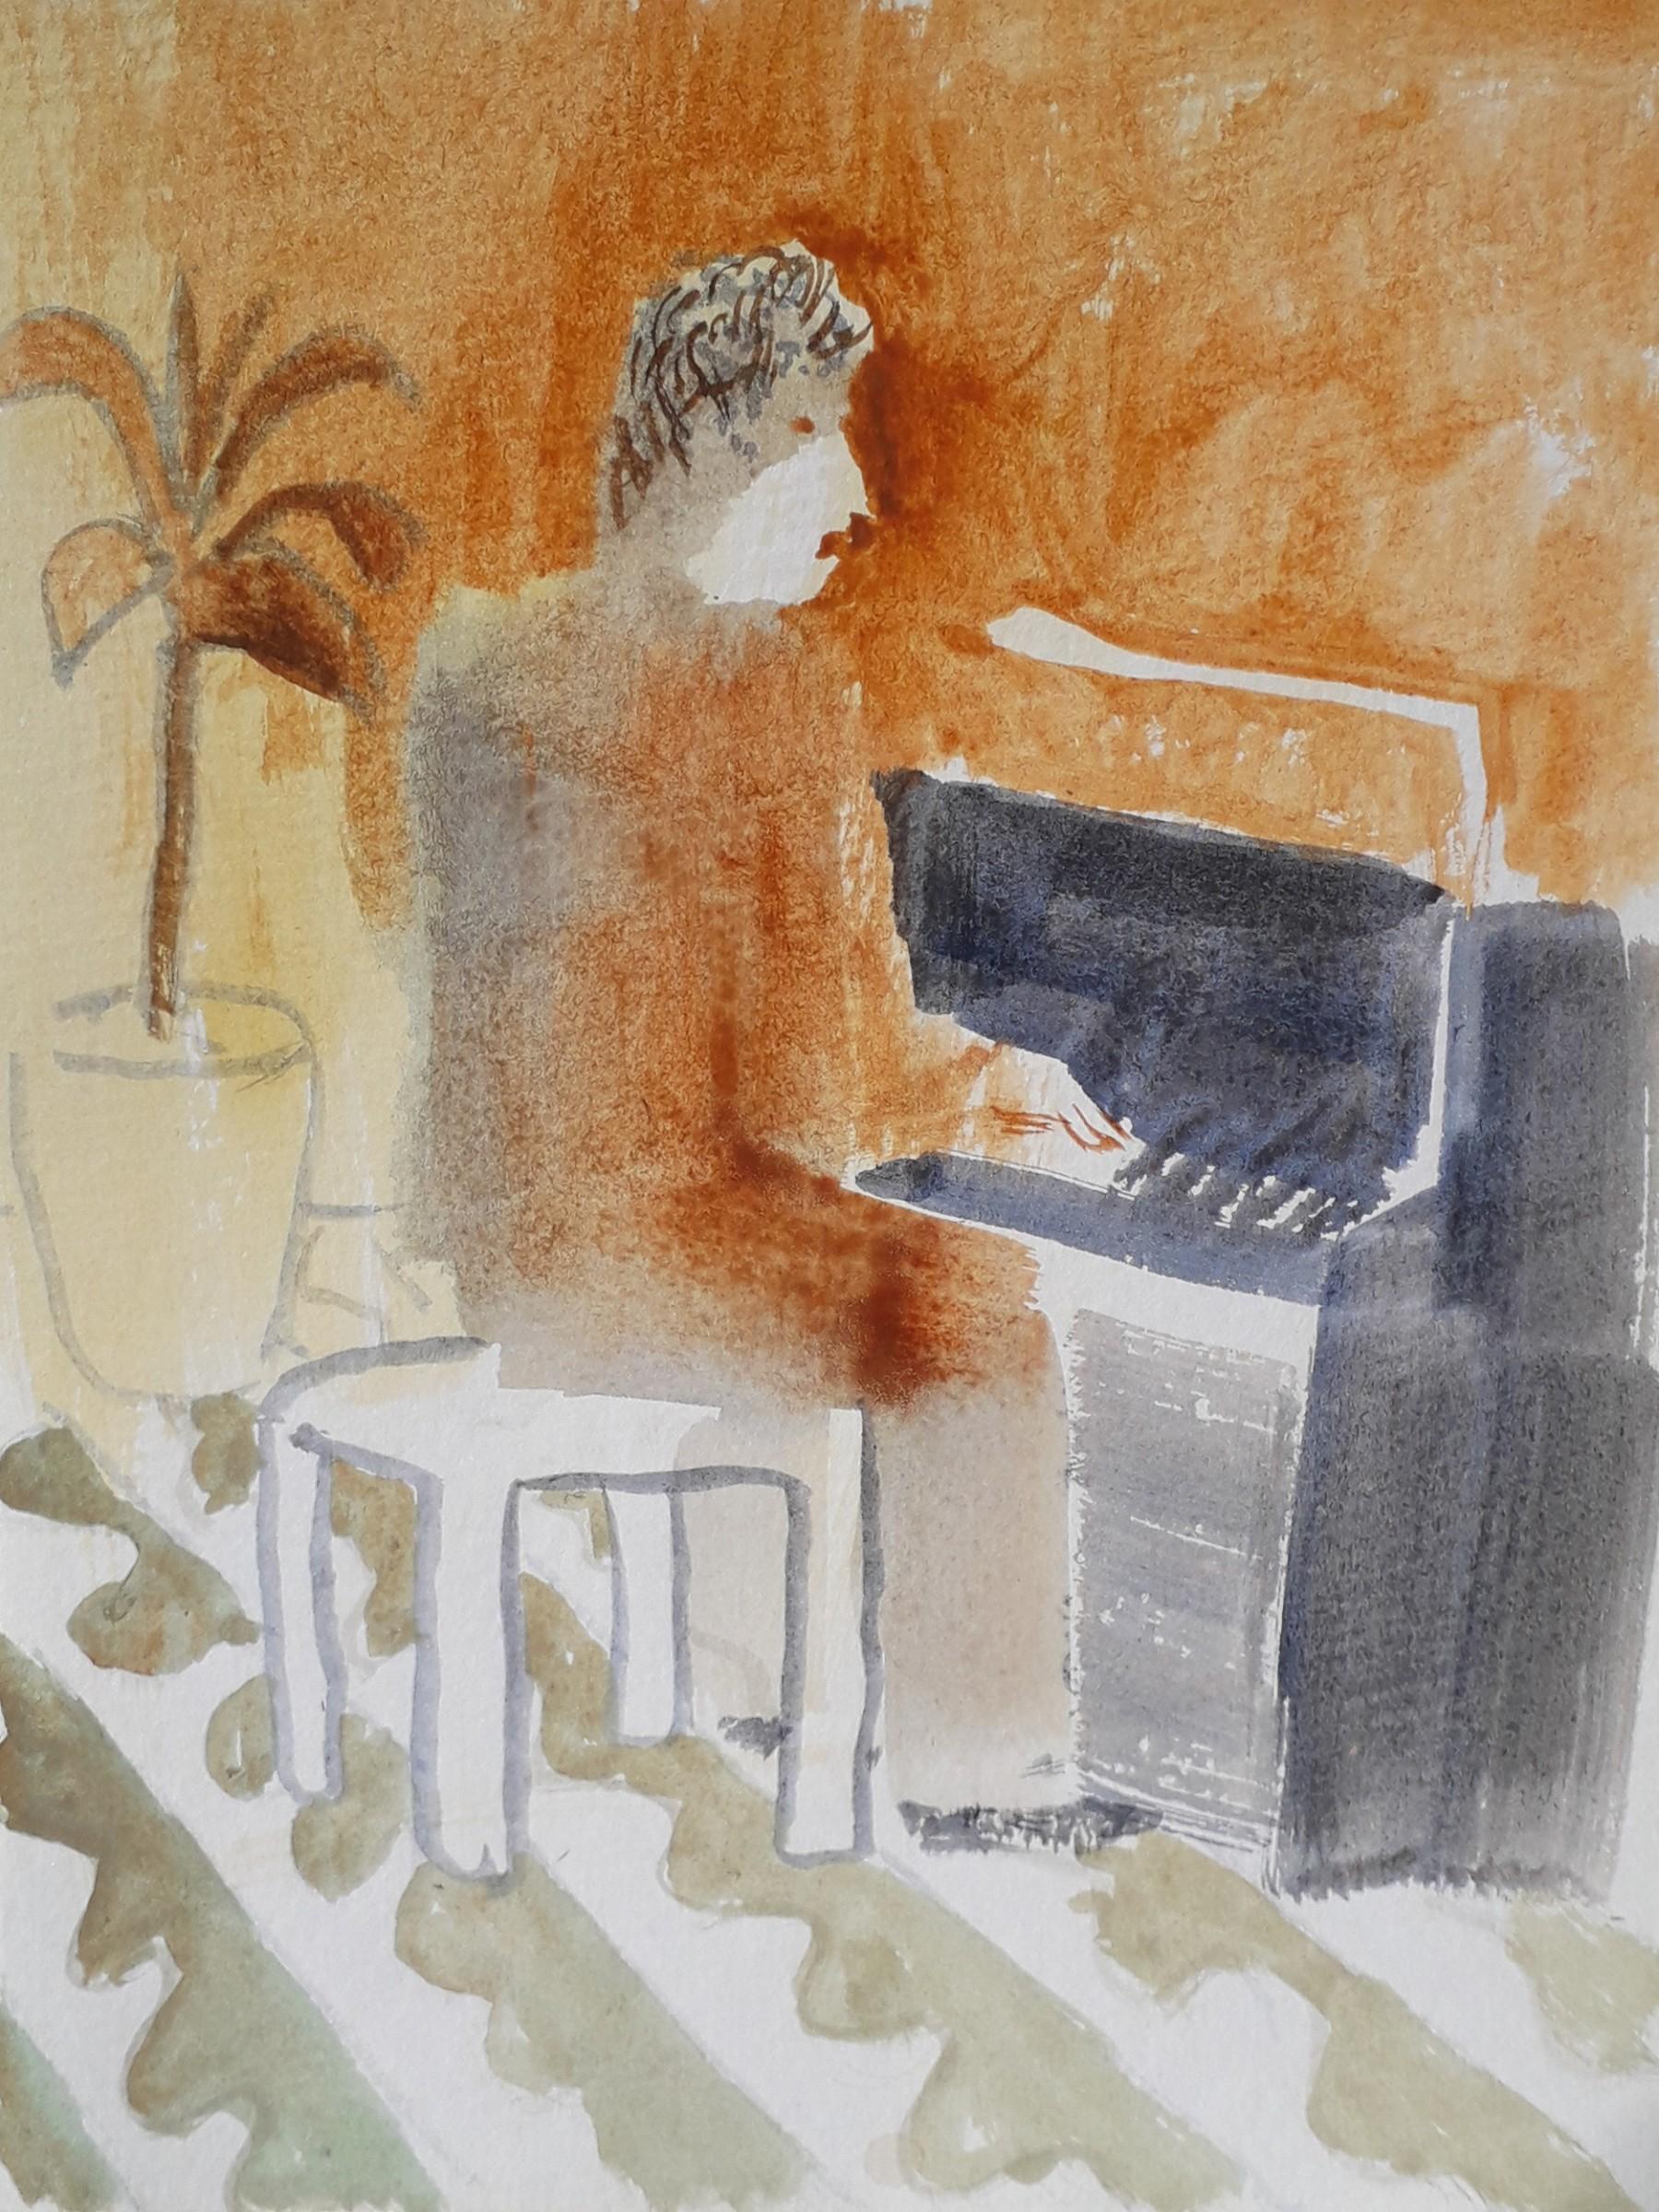 "<span class=""link fancybox-details-link""><a href=""/artists/103-richard-sorrell/works/12610-richard-sorrell-piano/"">View Detail Page</a></span><div class=""artist""><span class=""artist""><strong>Richard Sorrell</strong></span></div><div class=""title""><em>Piano</em></div><div class=""medium"">watercolour</div><div class=""dimensions"">Artwork: 25 x 20cm</div><div class=""price"">£350.00</div>"